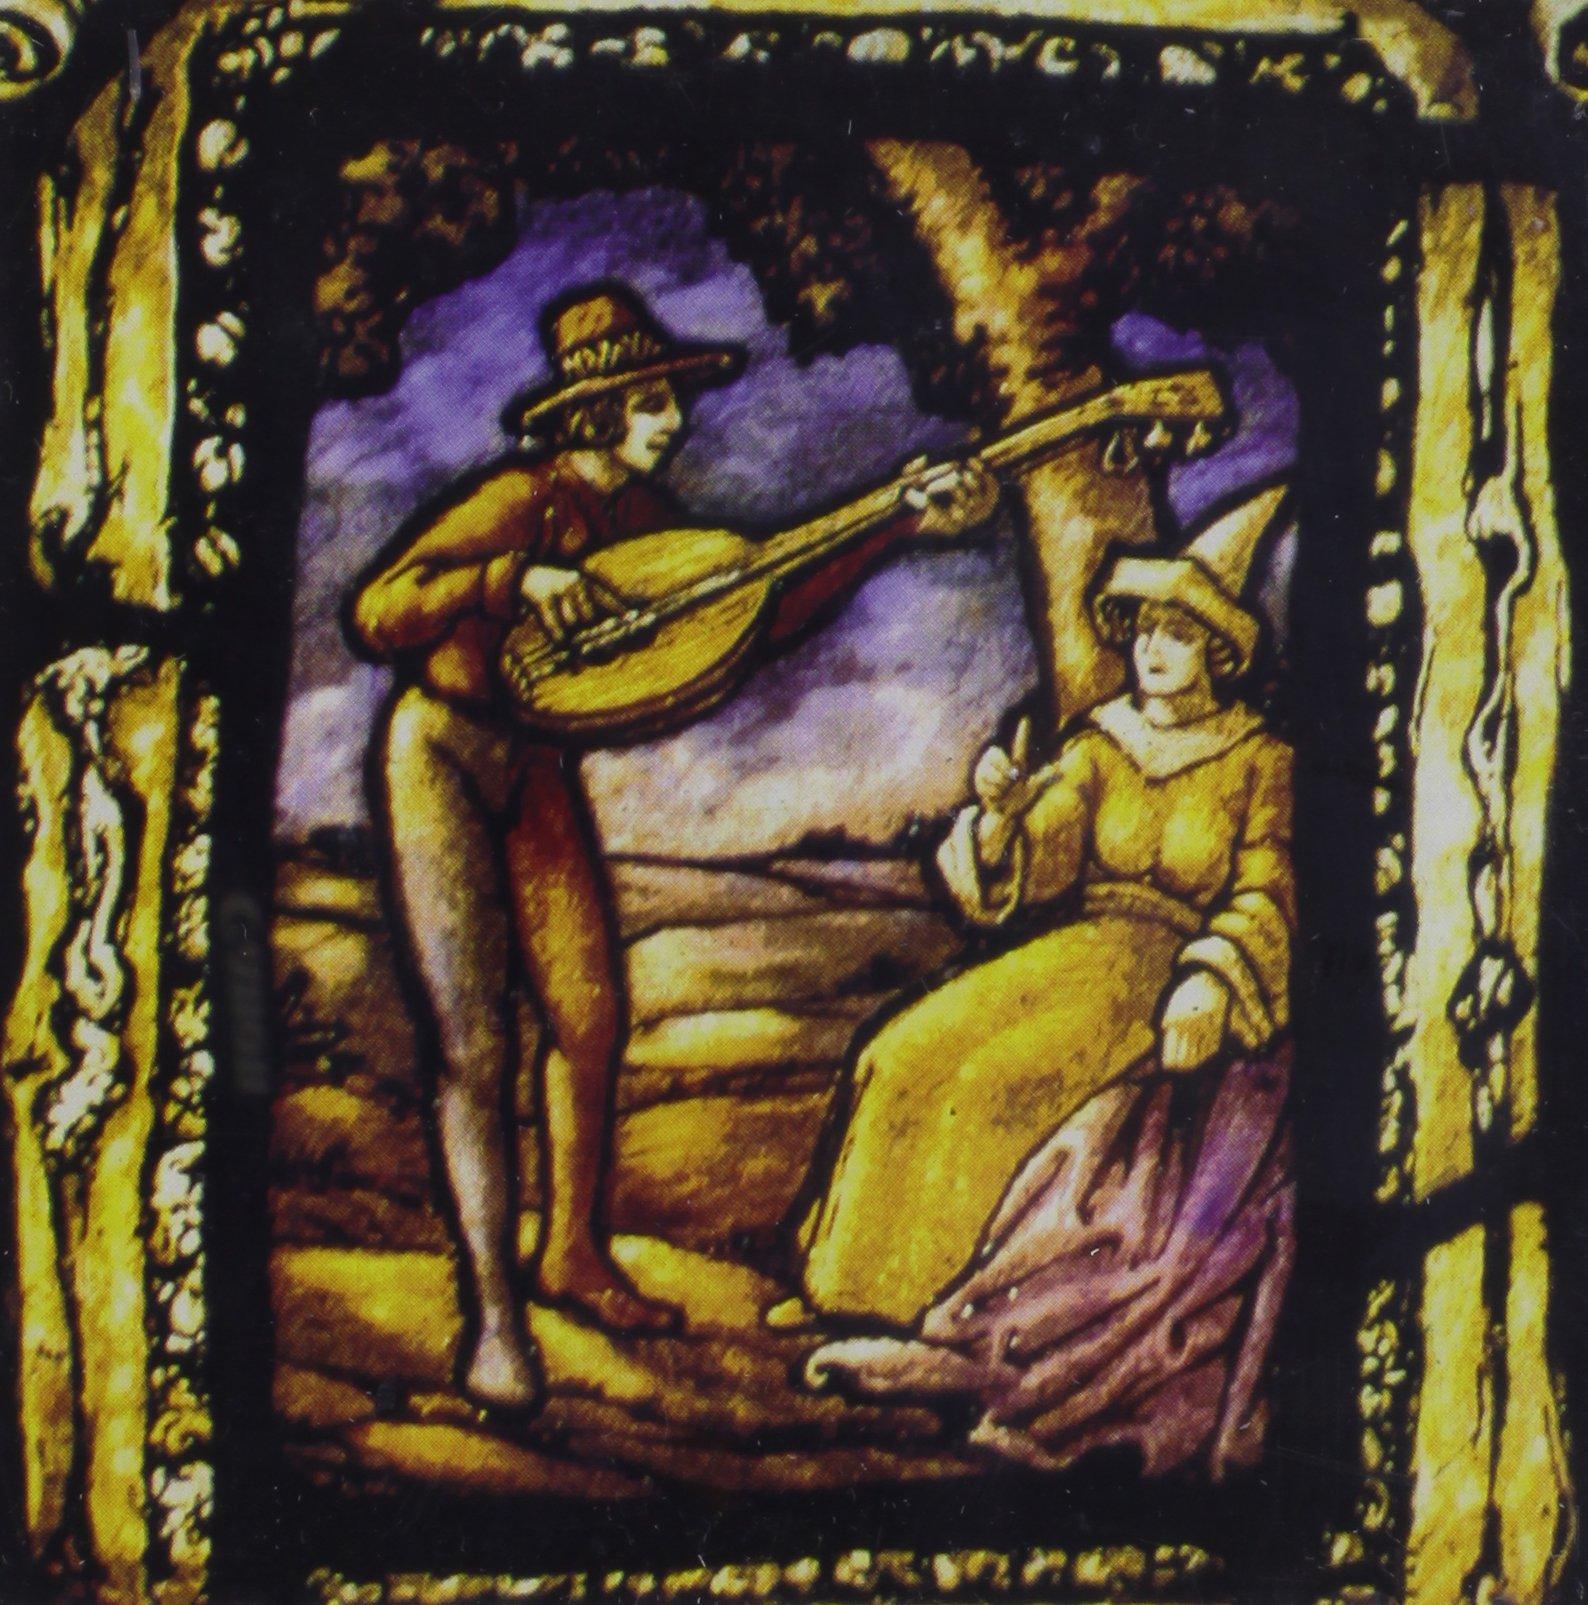 Mandolin Man by CD Baby